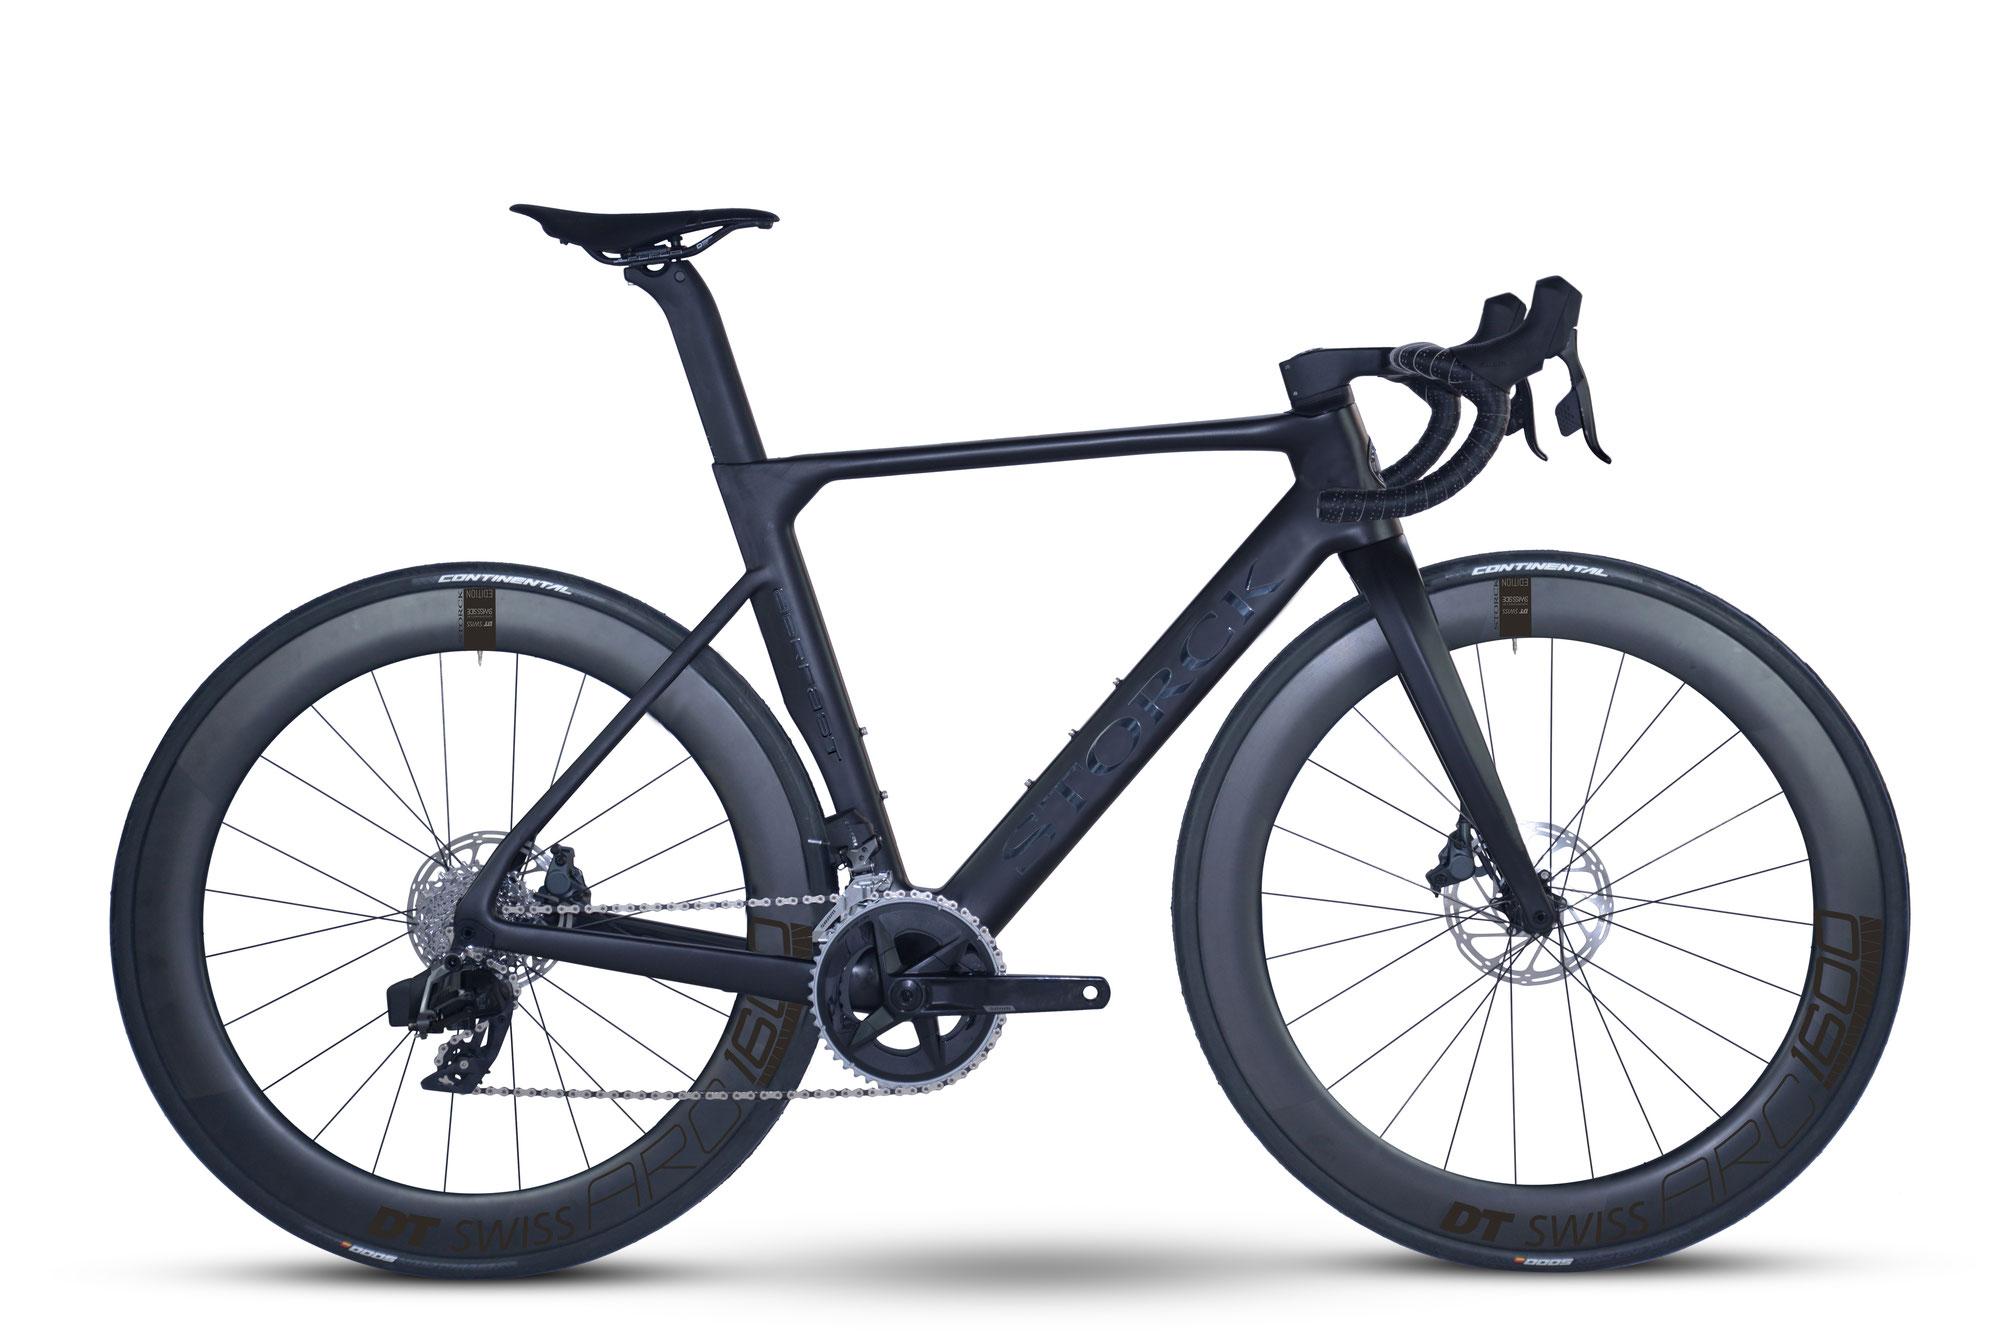 STORCK Bicycle mit brandneuer Gruppe SRAM Rival eTap AXS